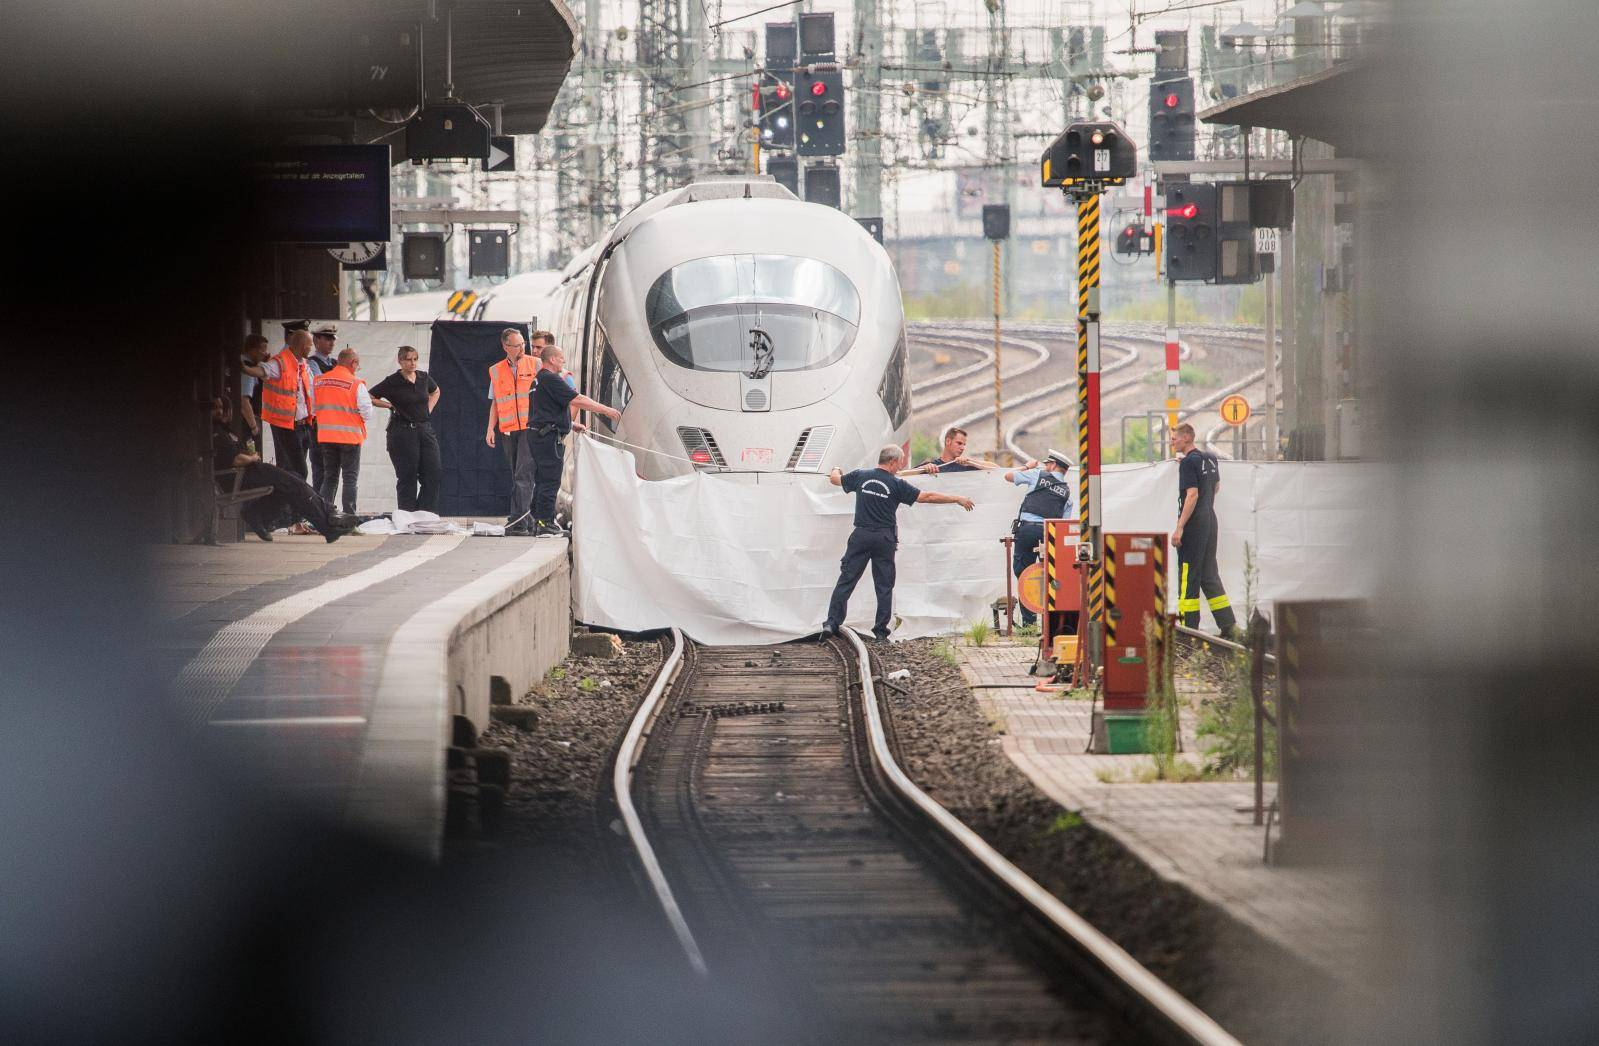 Attack in Frankfurt train station